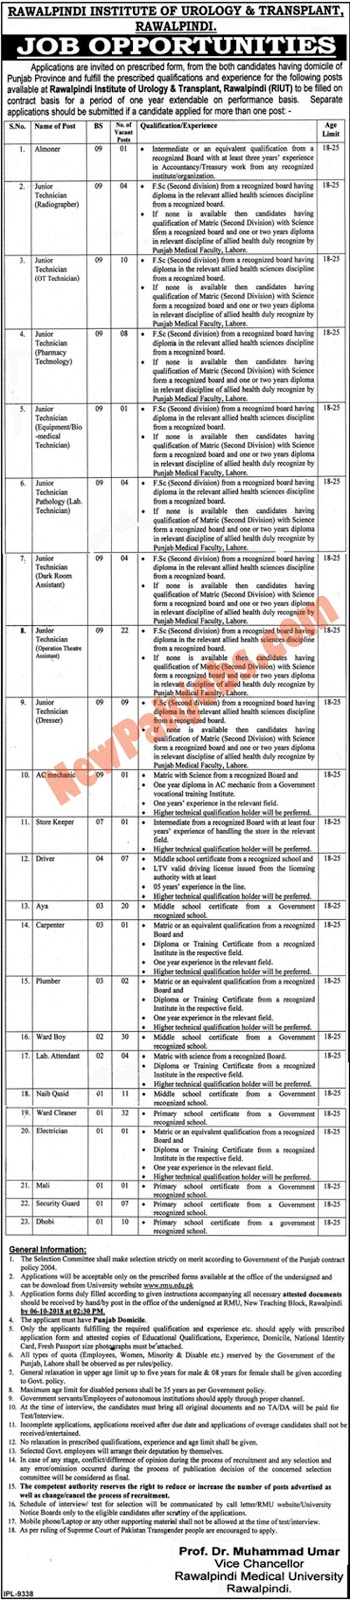 Latest 191 Vacancies In Rawalpindi Institute Of Urology & Transplant 2018